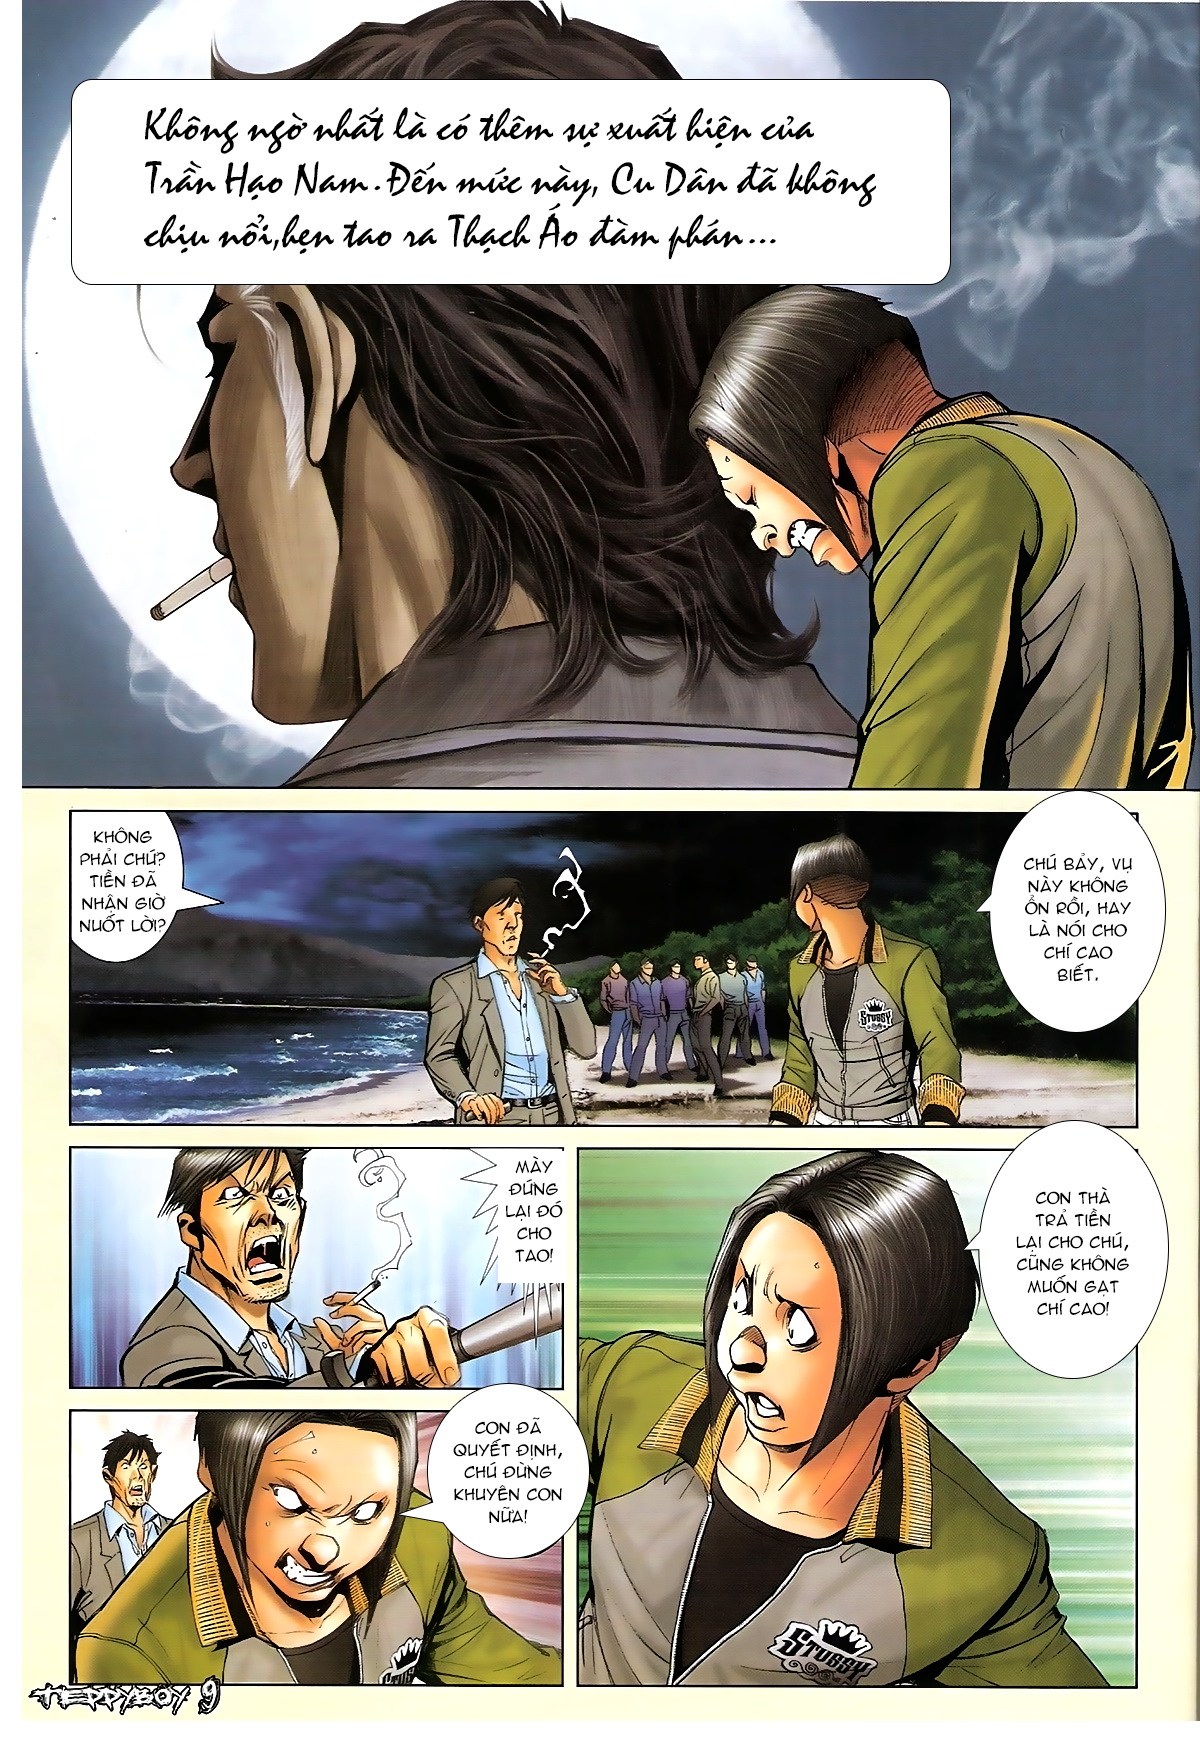 Người Trong Giang Hồ Chap 1362 - Truyen.Chap.VN